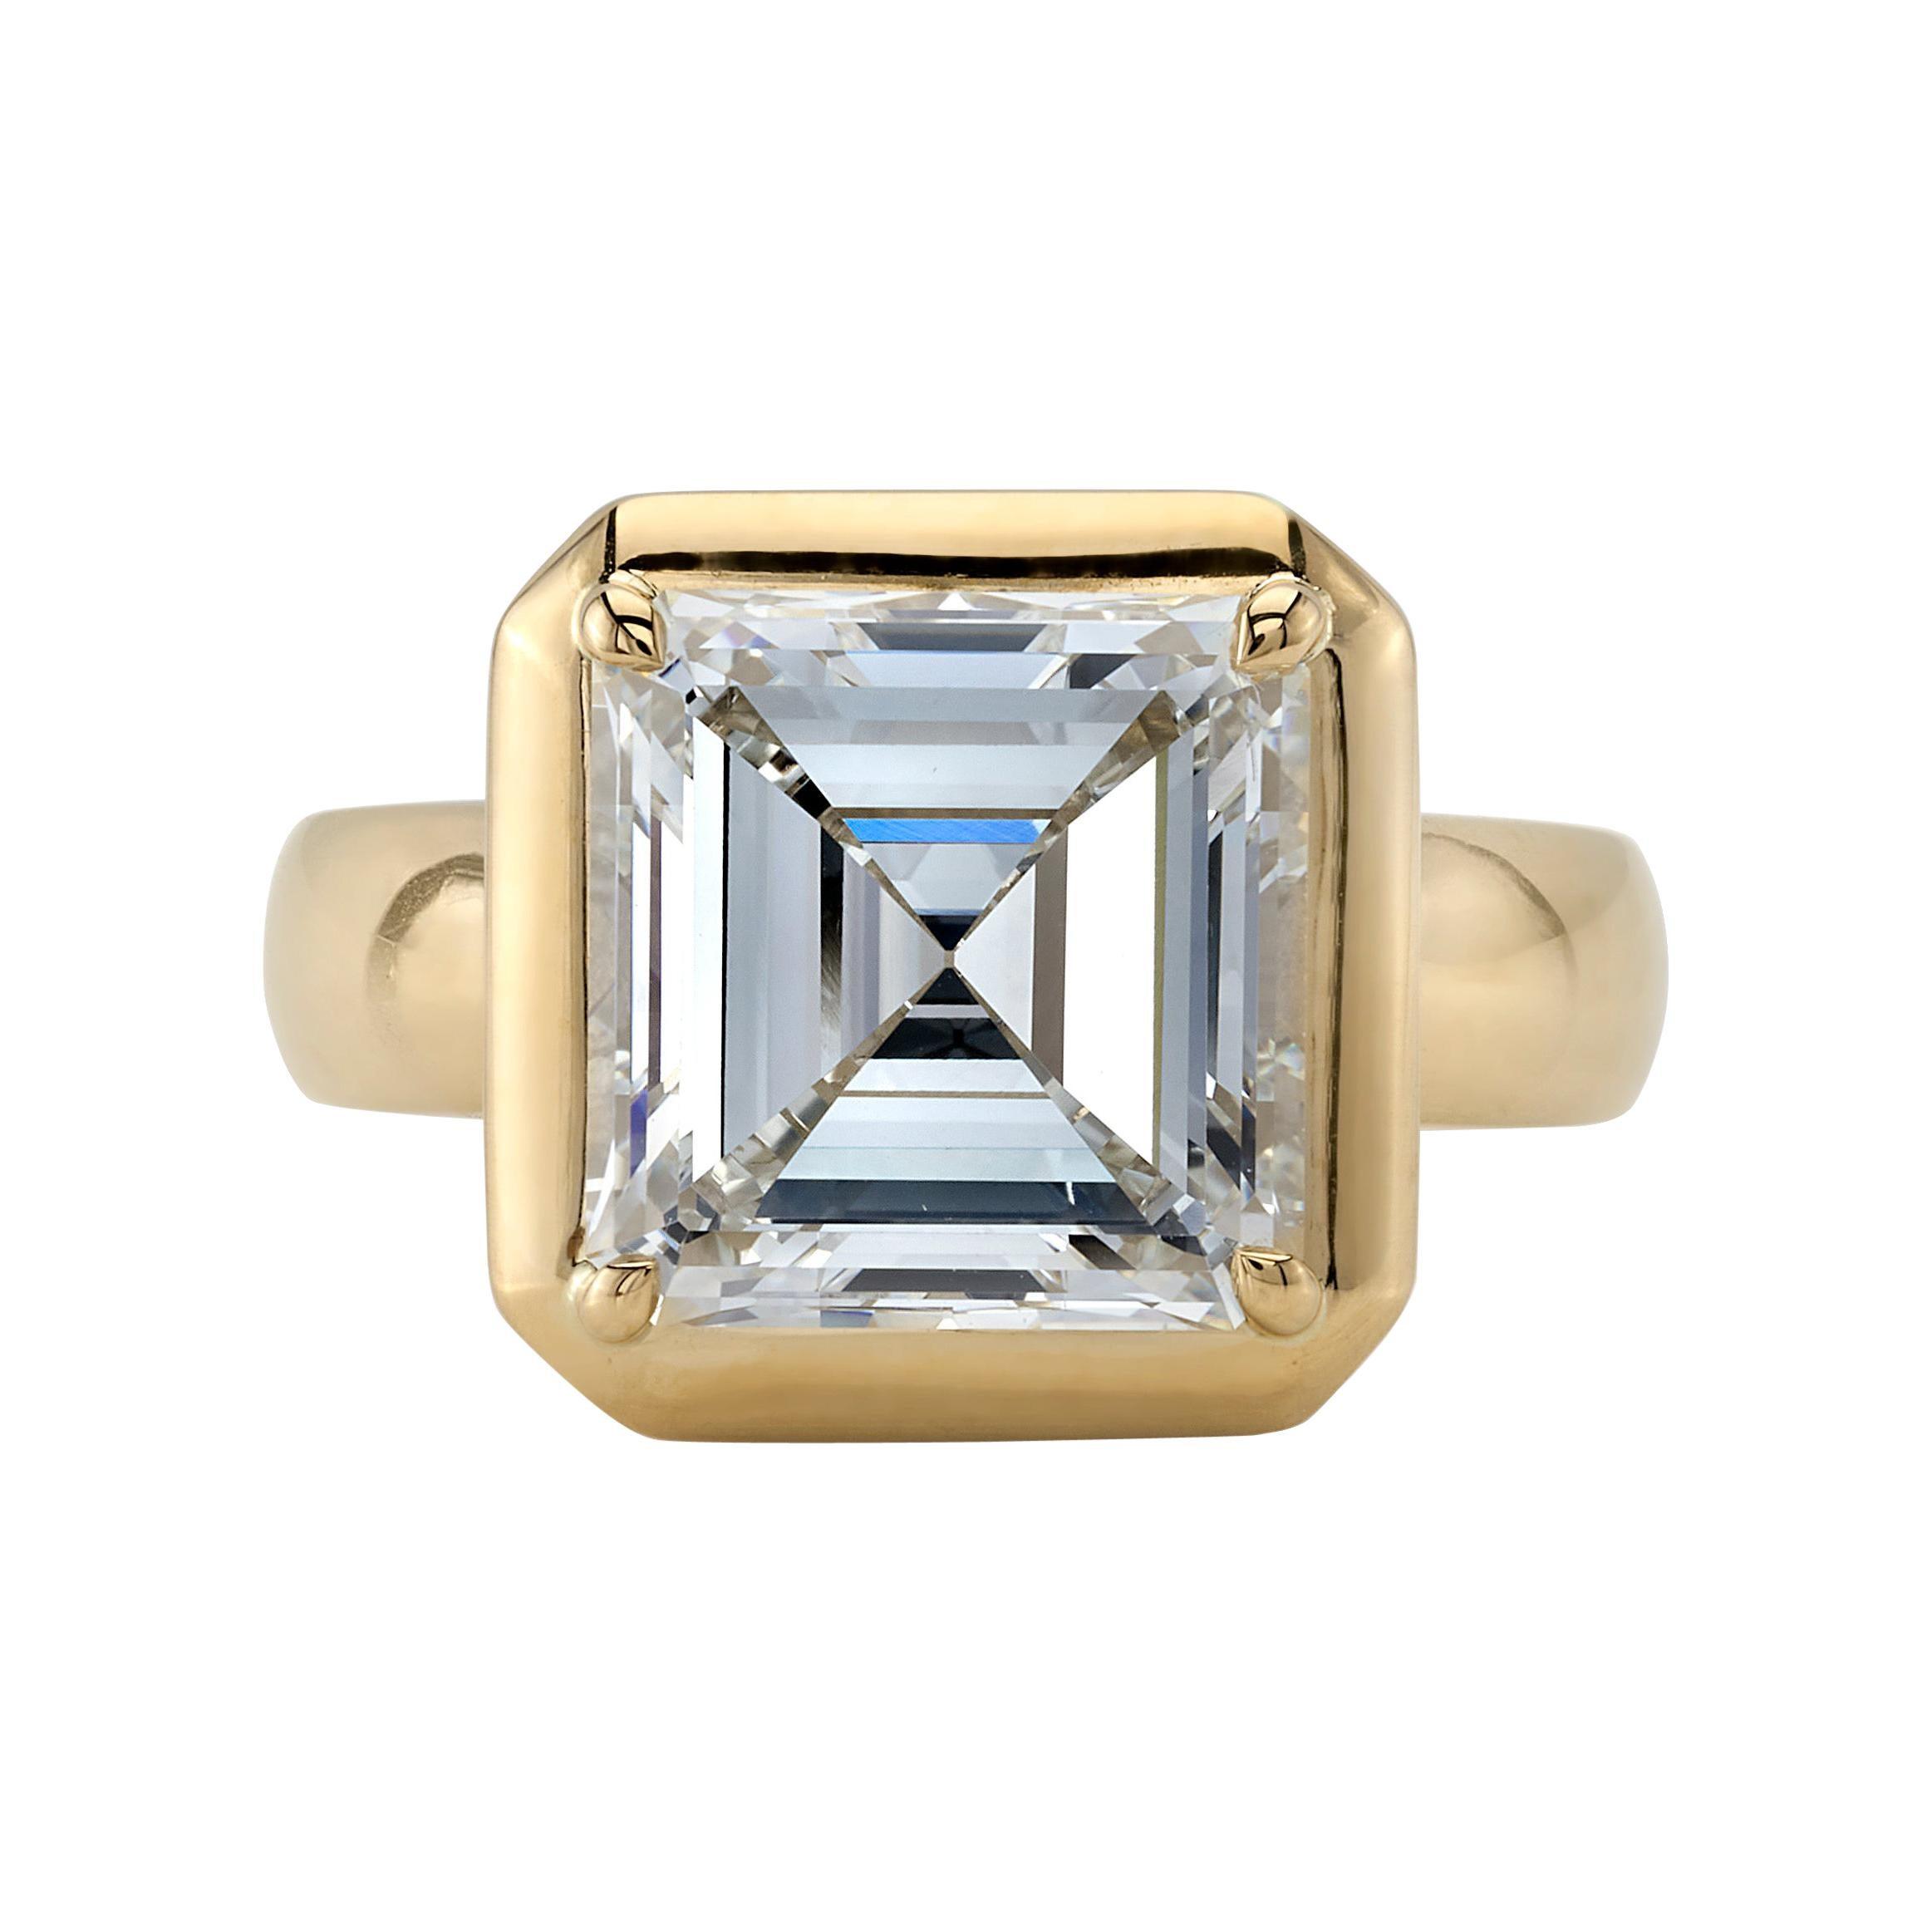 Handcrafted Cori Asscher Cut Diamond Ring by Single Stone